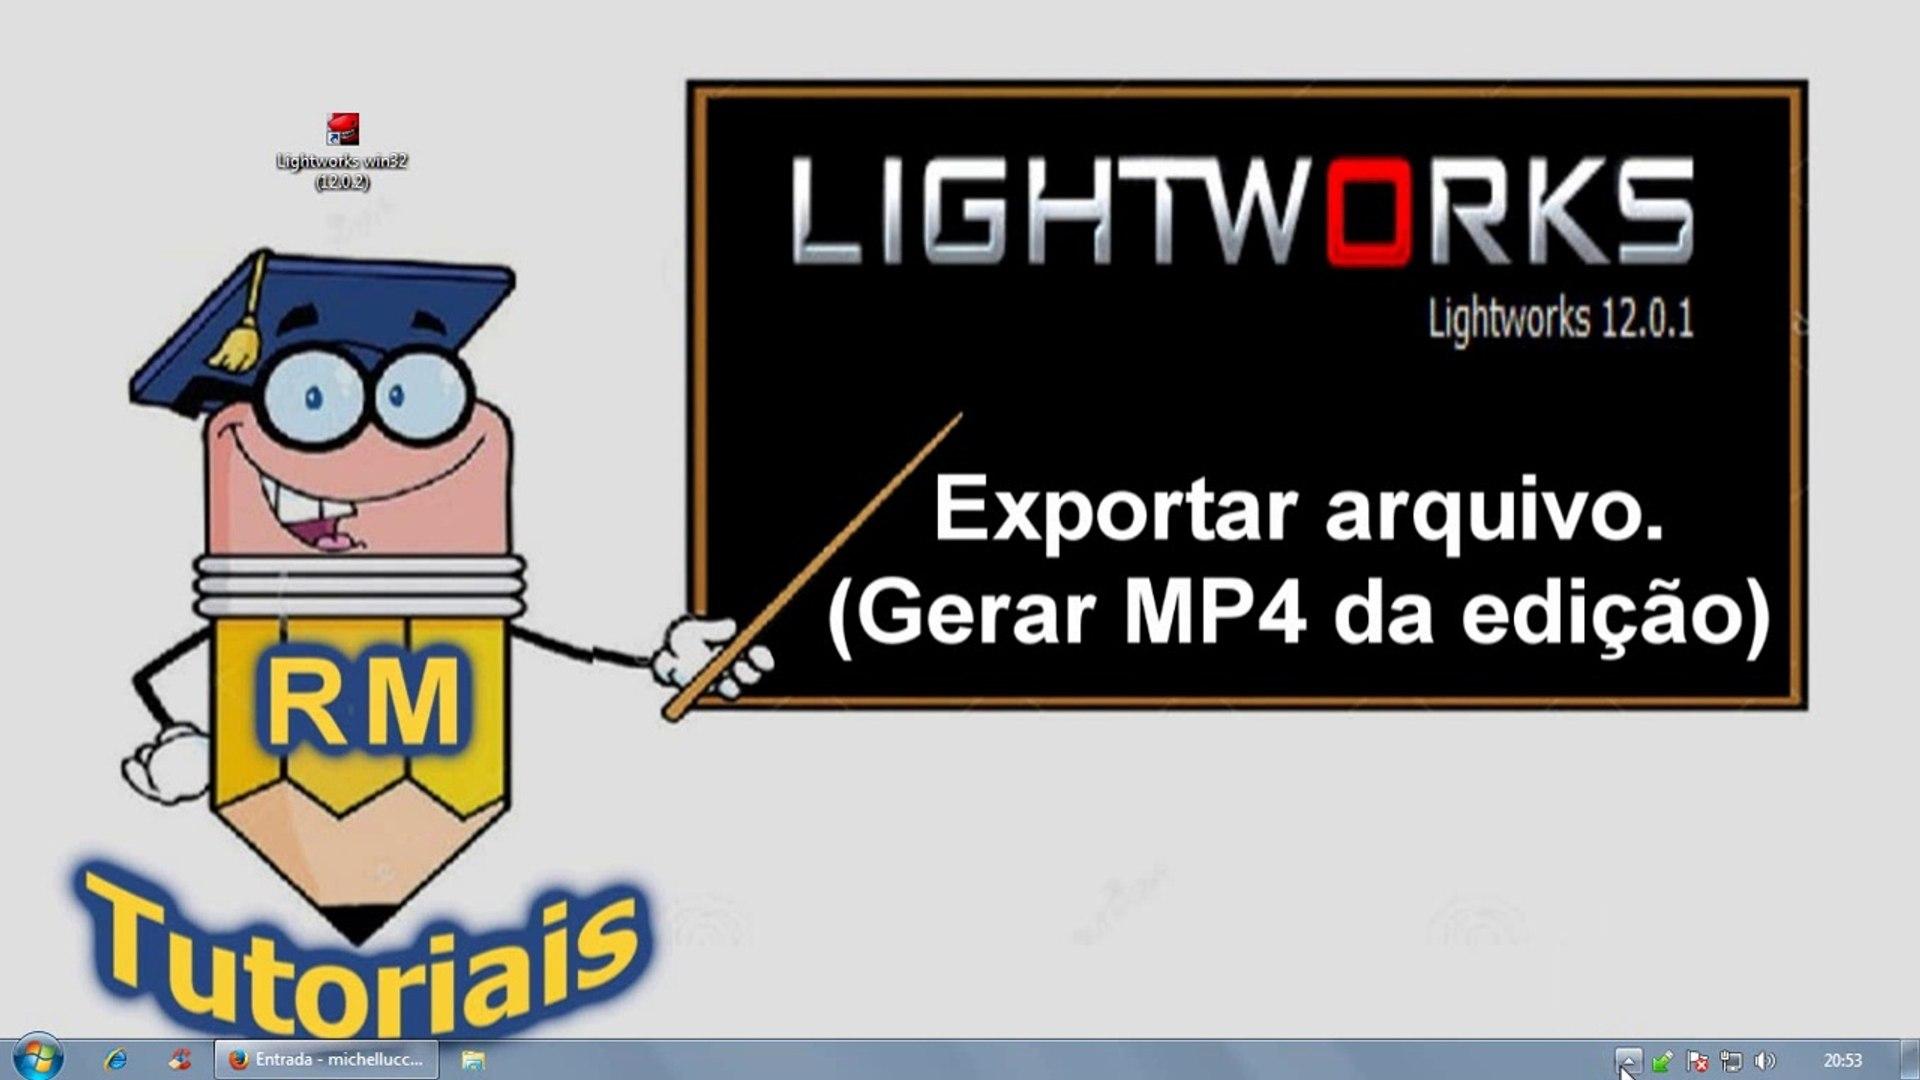 Lightworks Parte 5 - Exportar arquivo (gerar vídeo MP4)